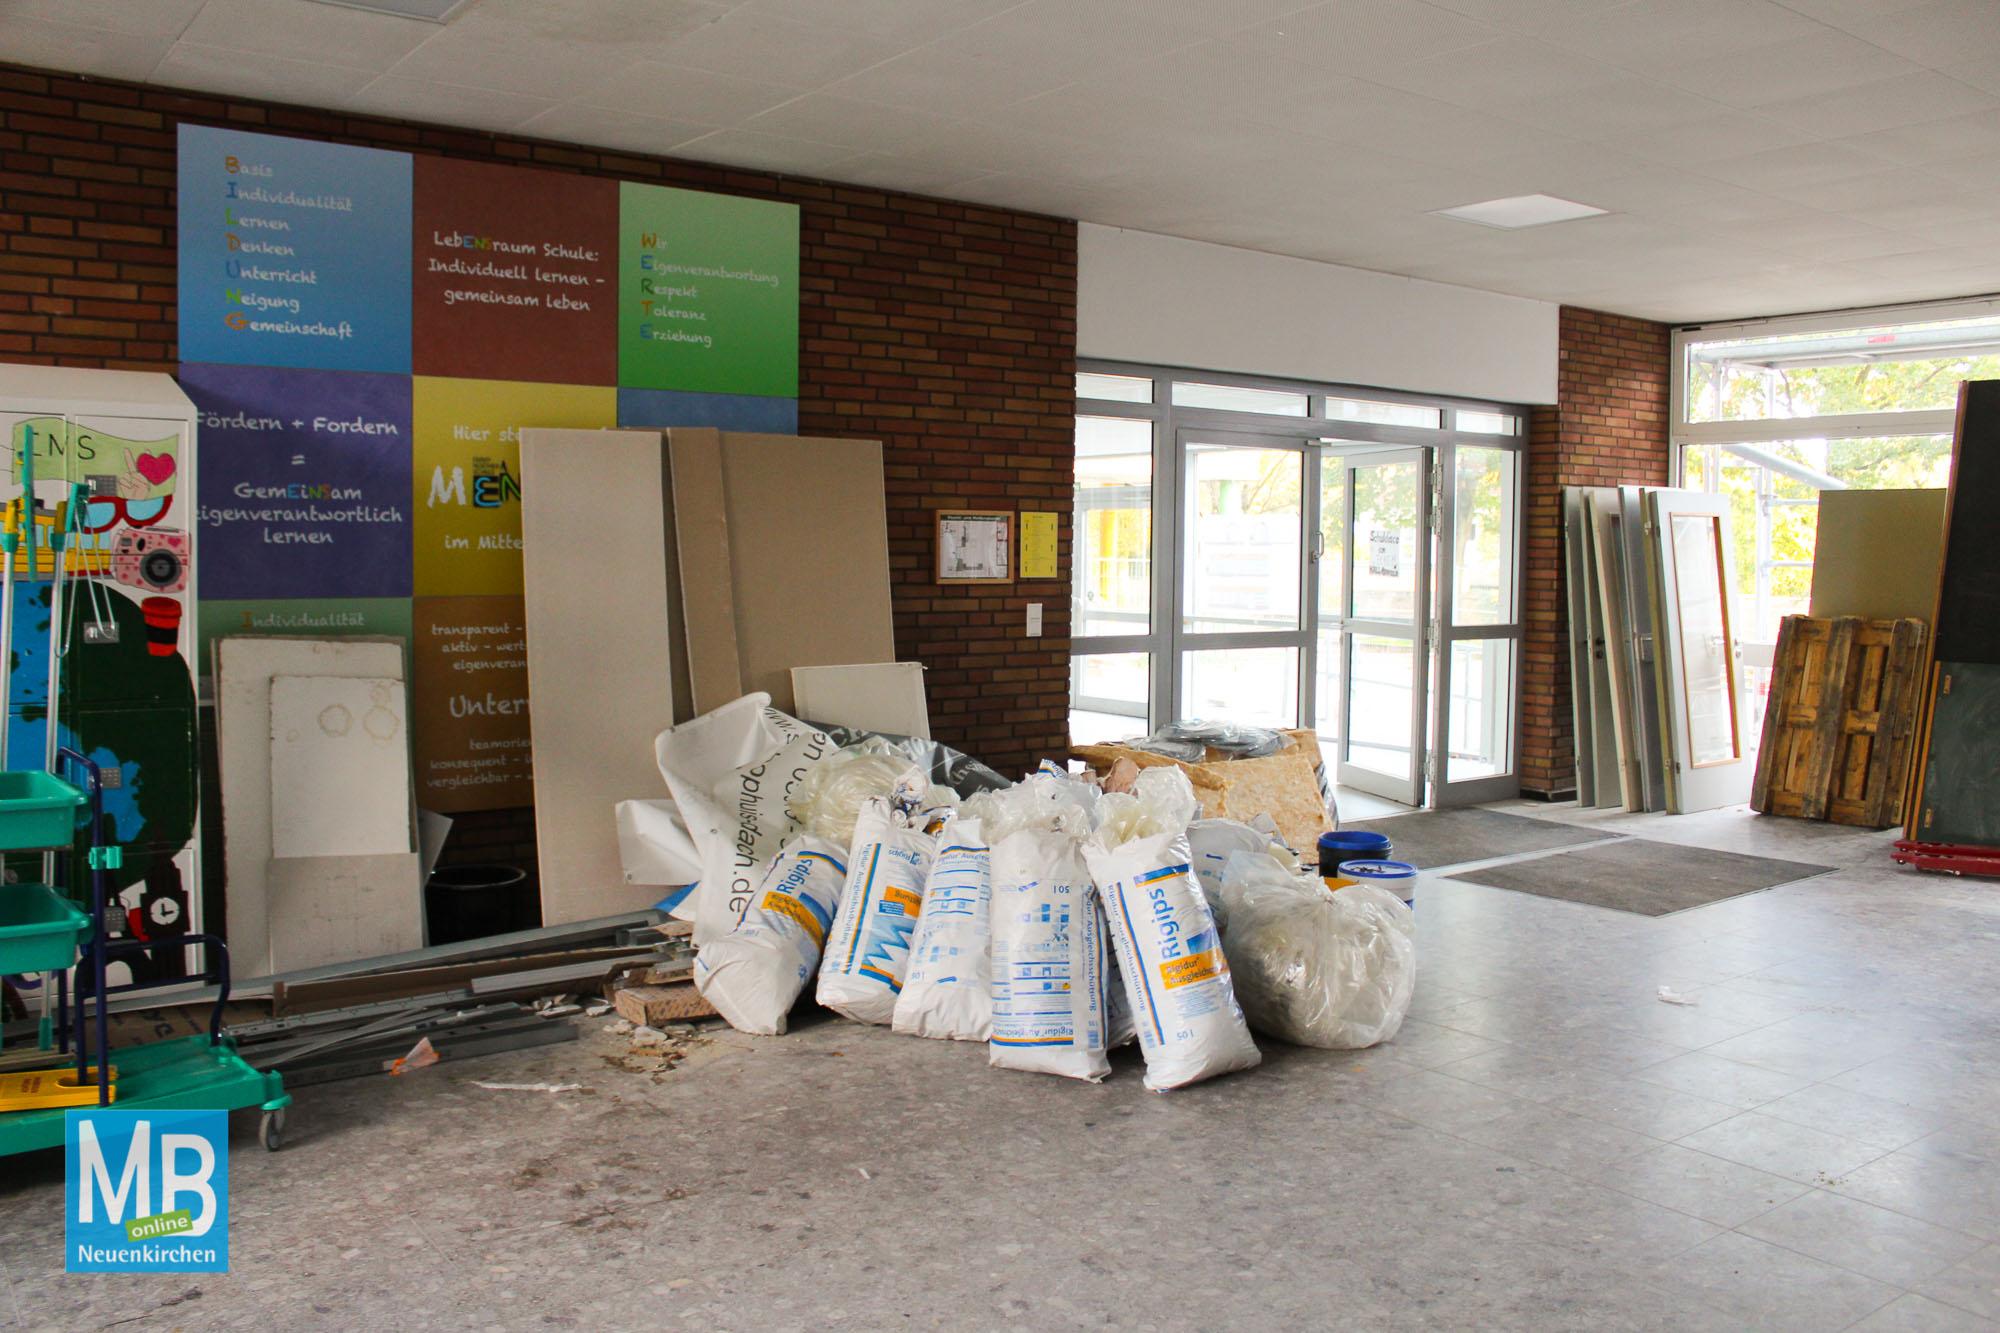 Baustellenbesichtigung: Ehemalige Heriburgschule. | Foto: Lea Helene Kaumanns